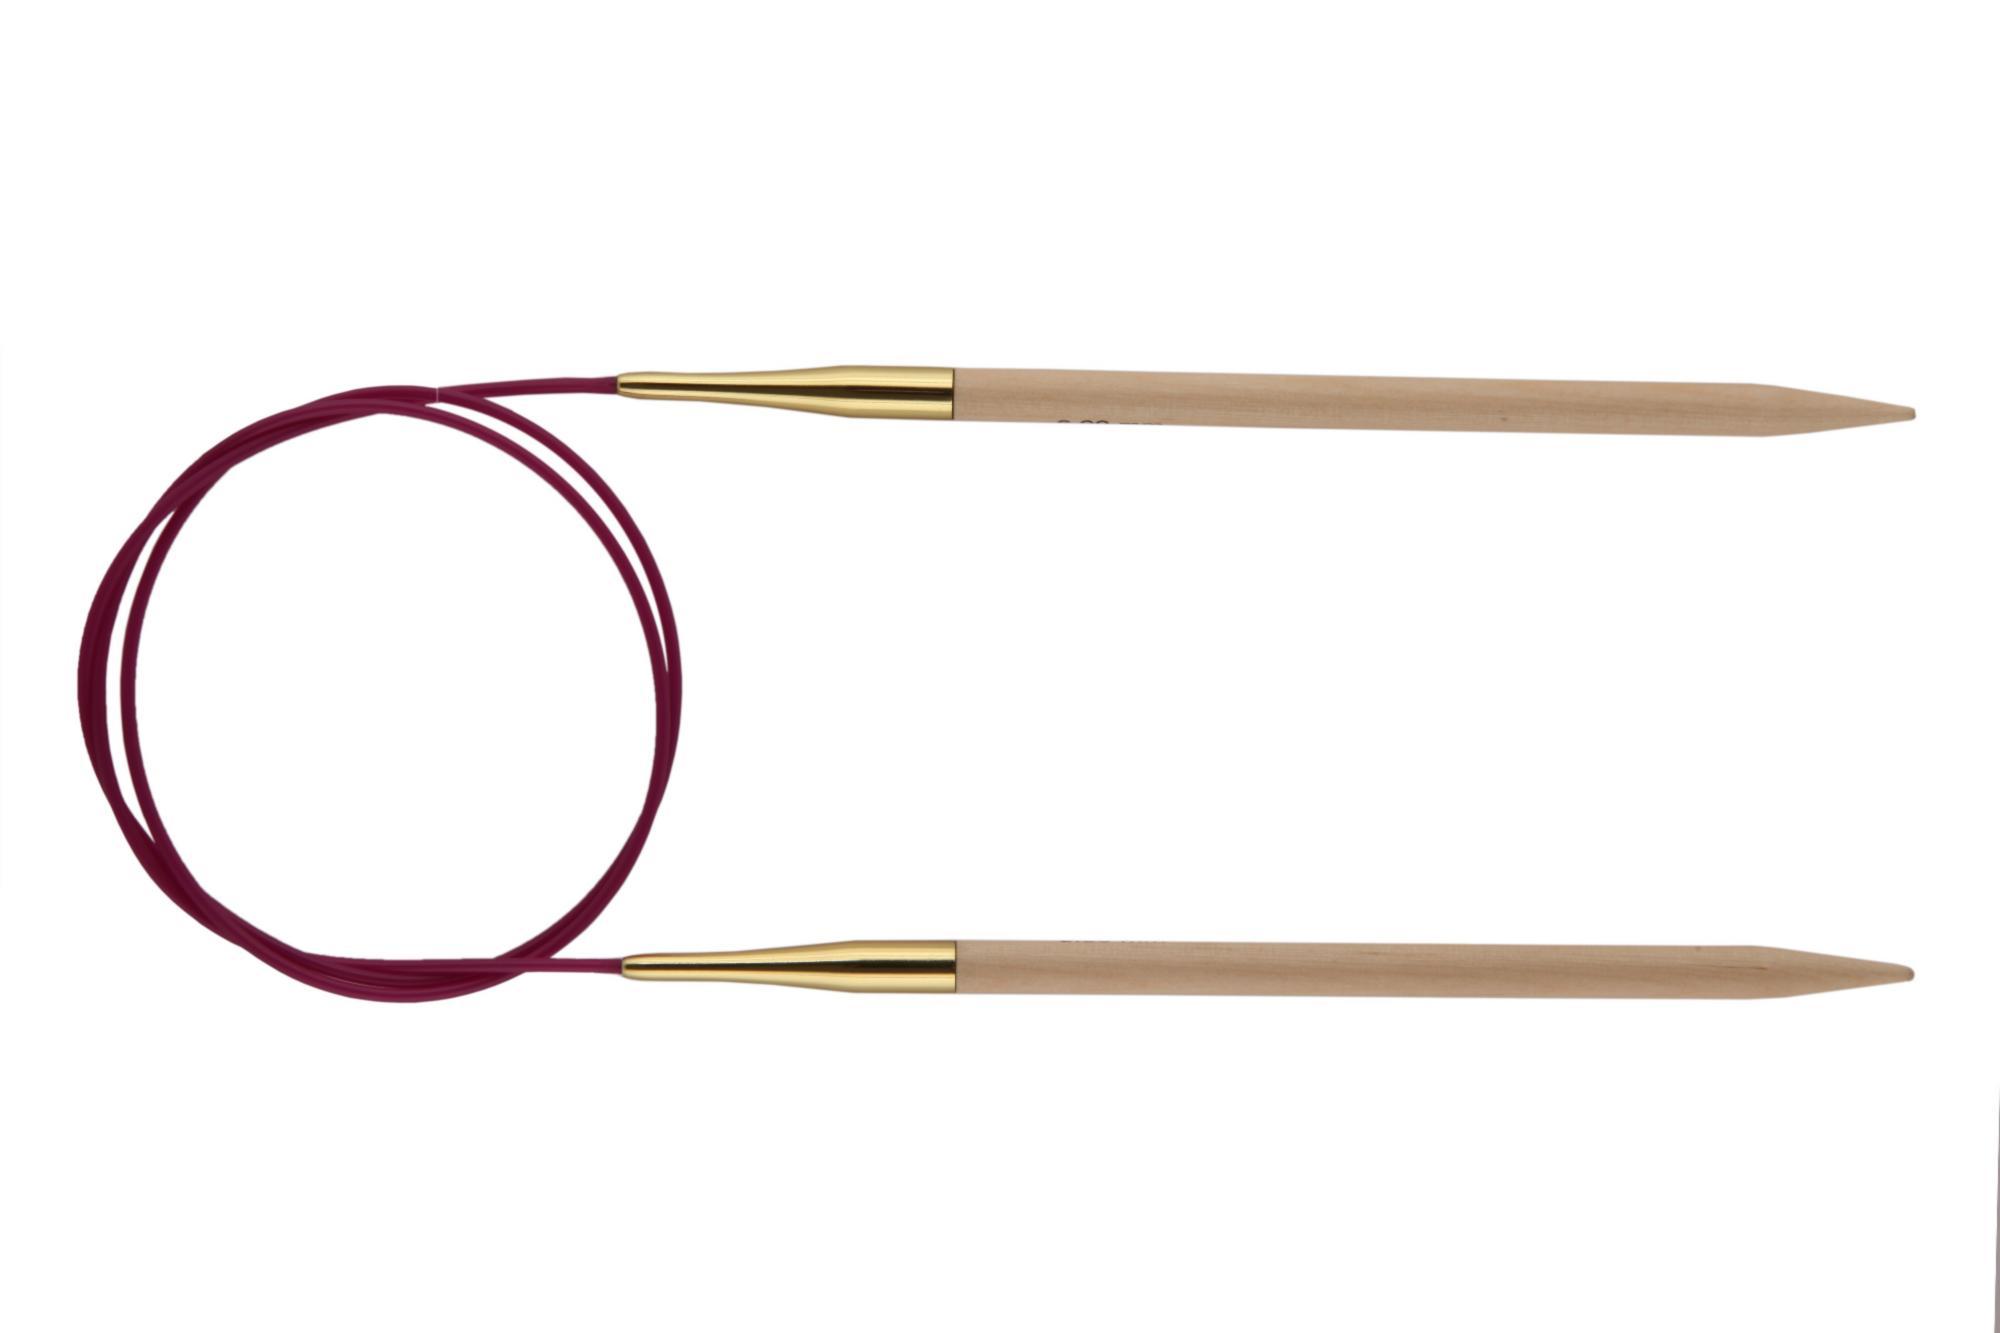 Спицы круговые 150 см Basix Birch Wood KnitPro, 35416, 5.00 мм